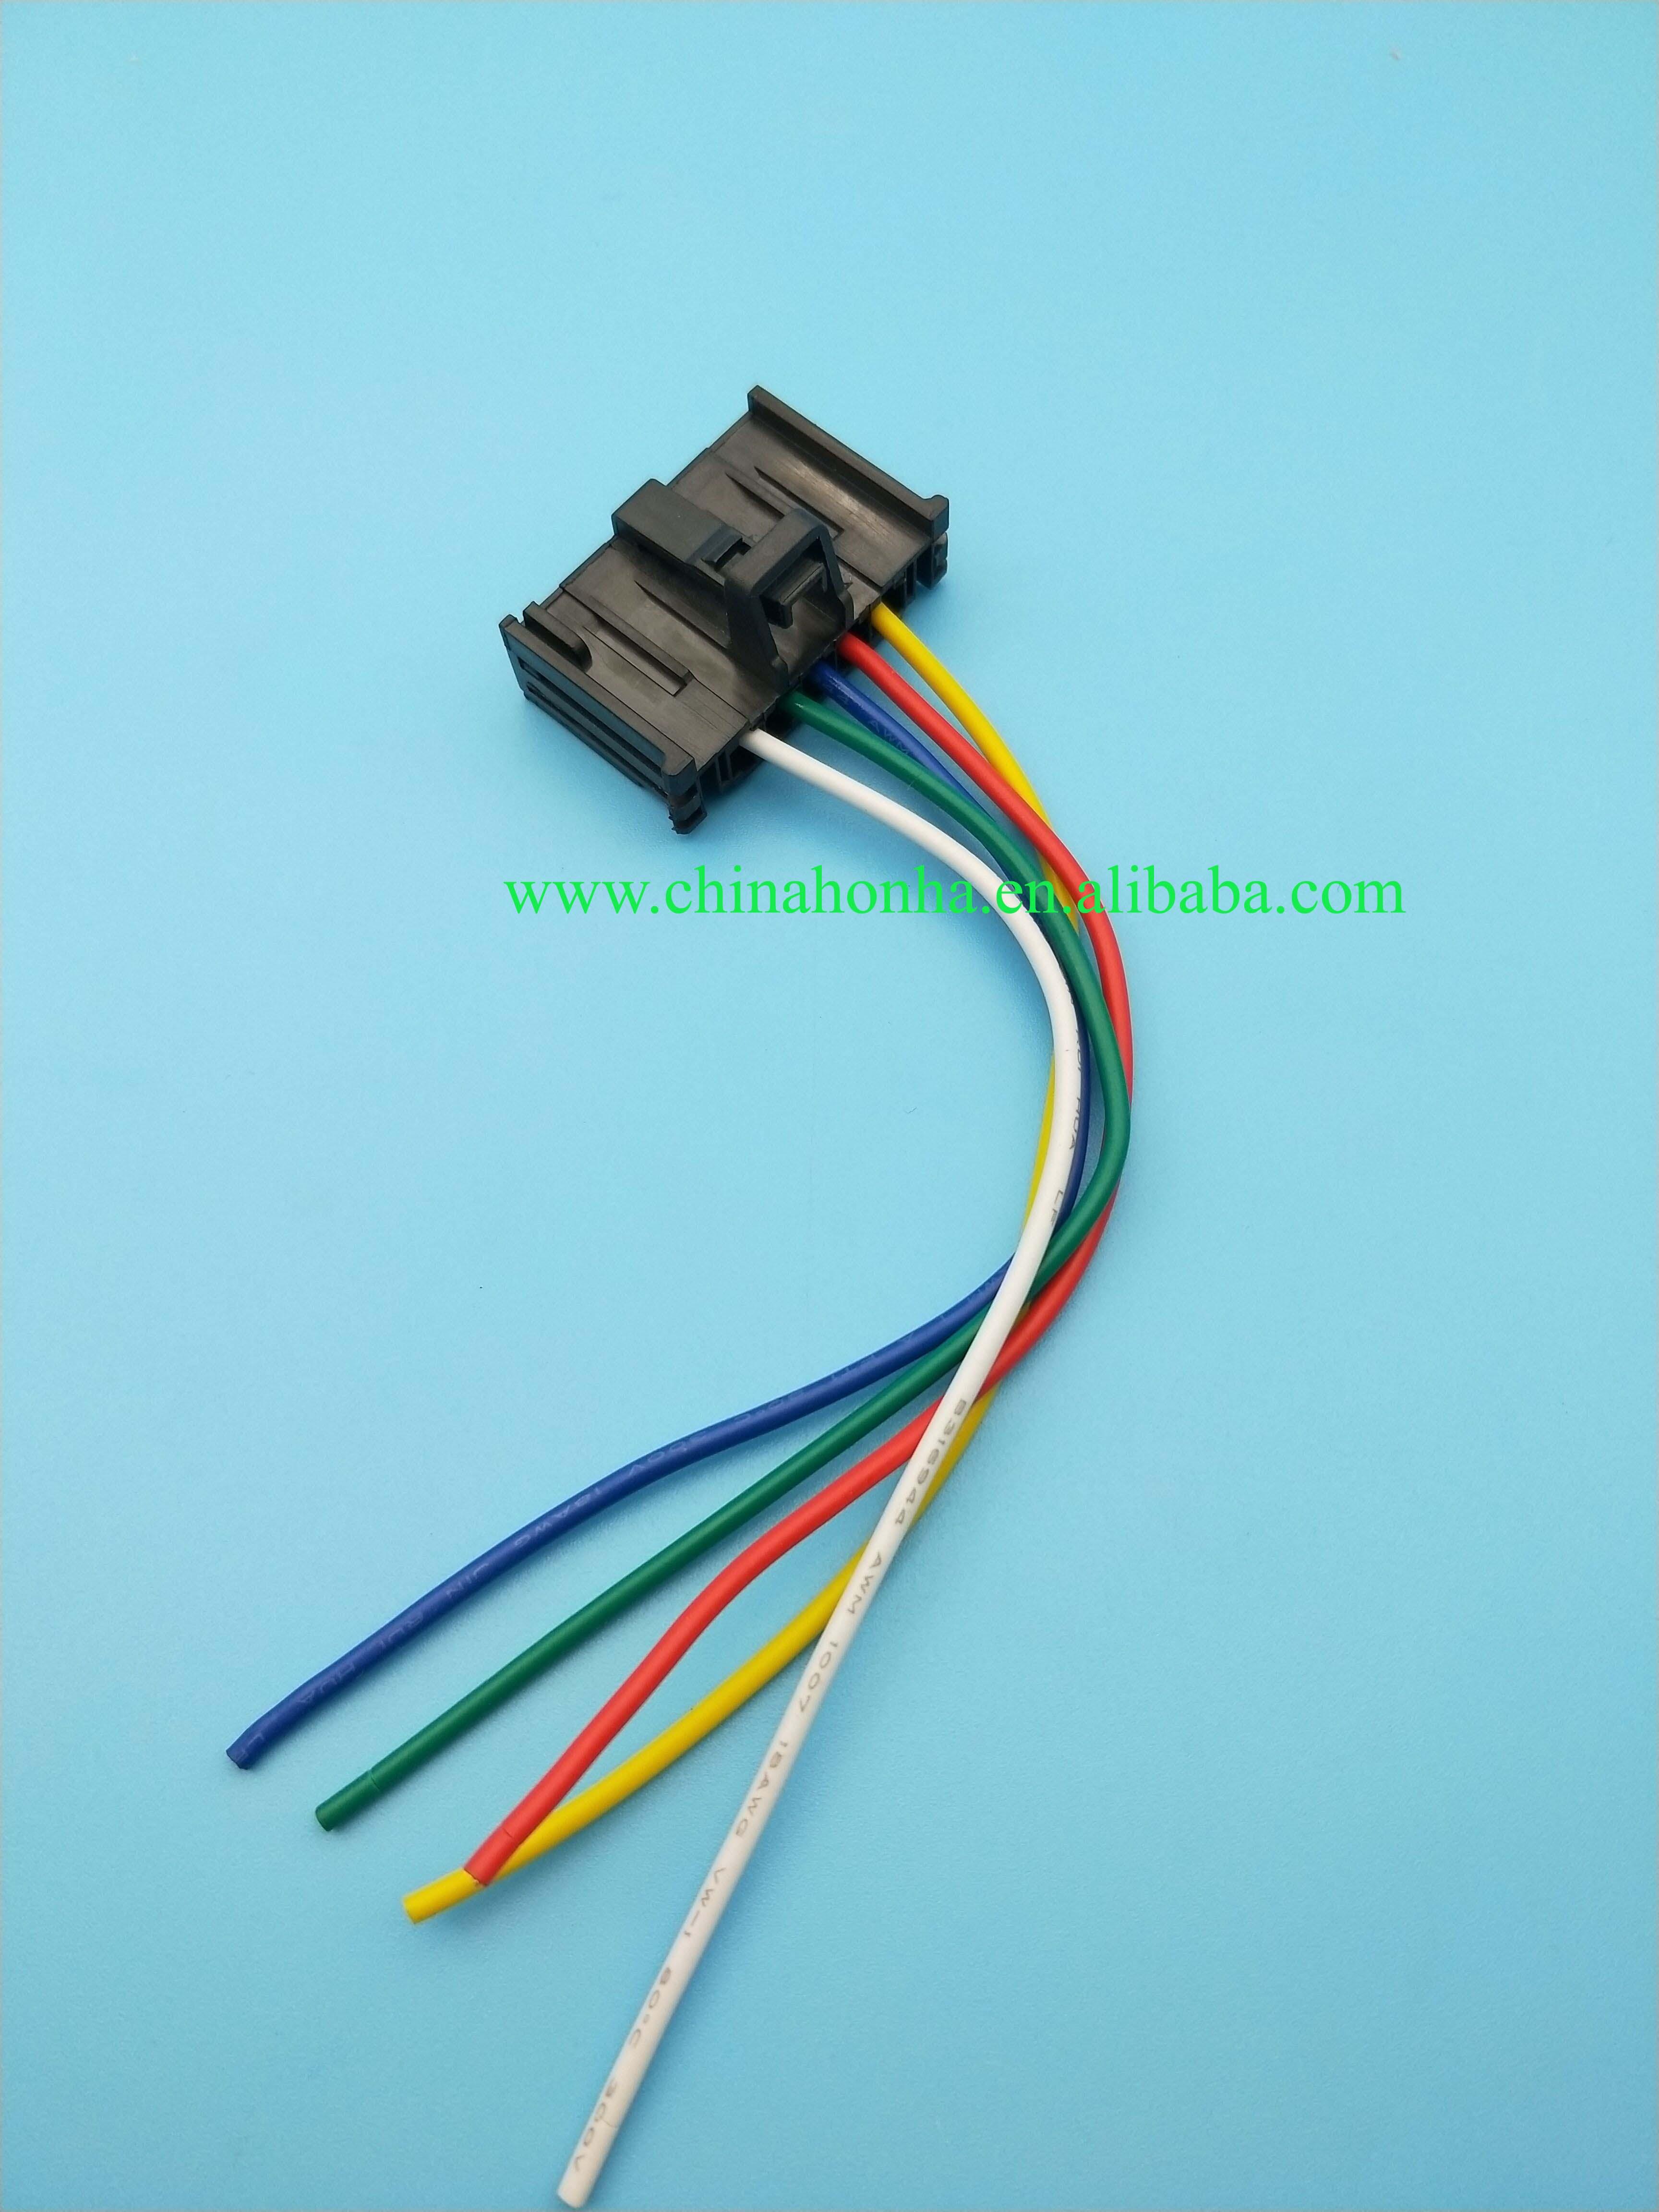 Conector hembra de 5 pines para el ventilador del motor del ventilador de la resistencia del ventilador 13248240 6450XR